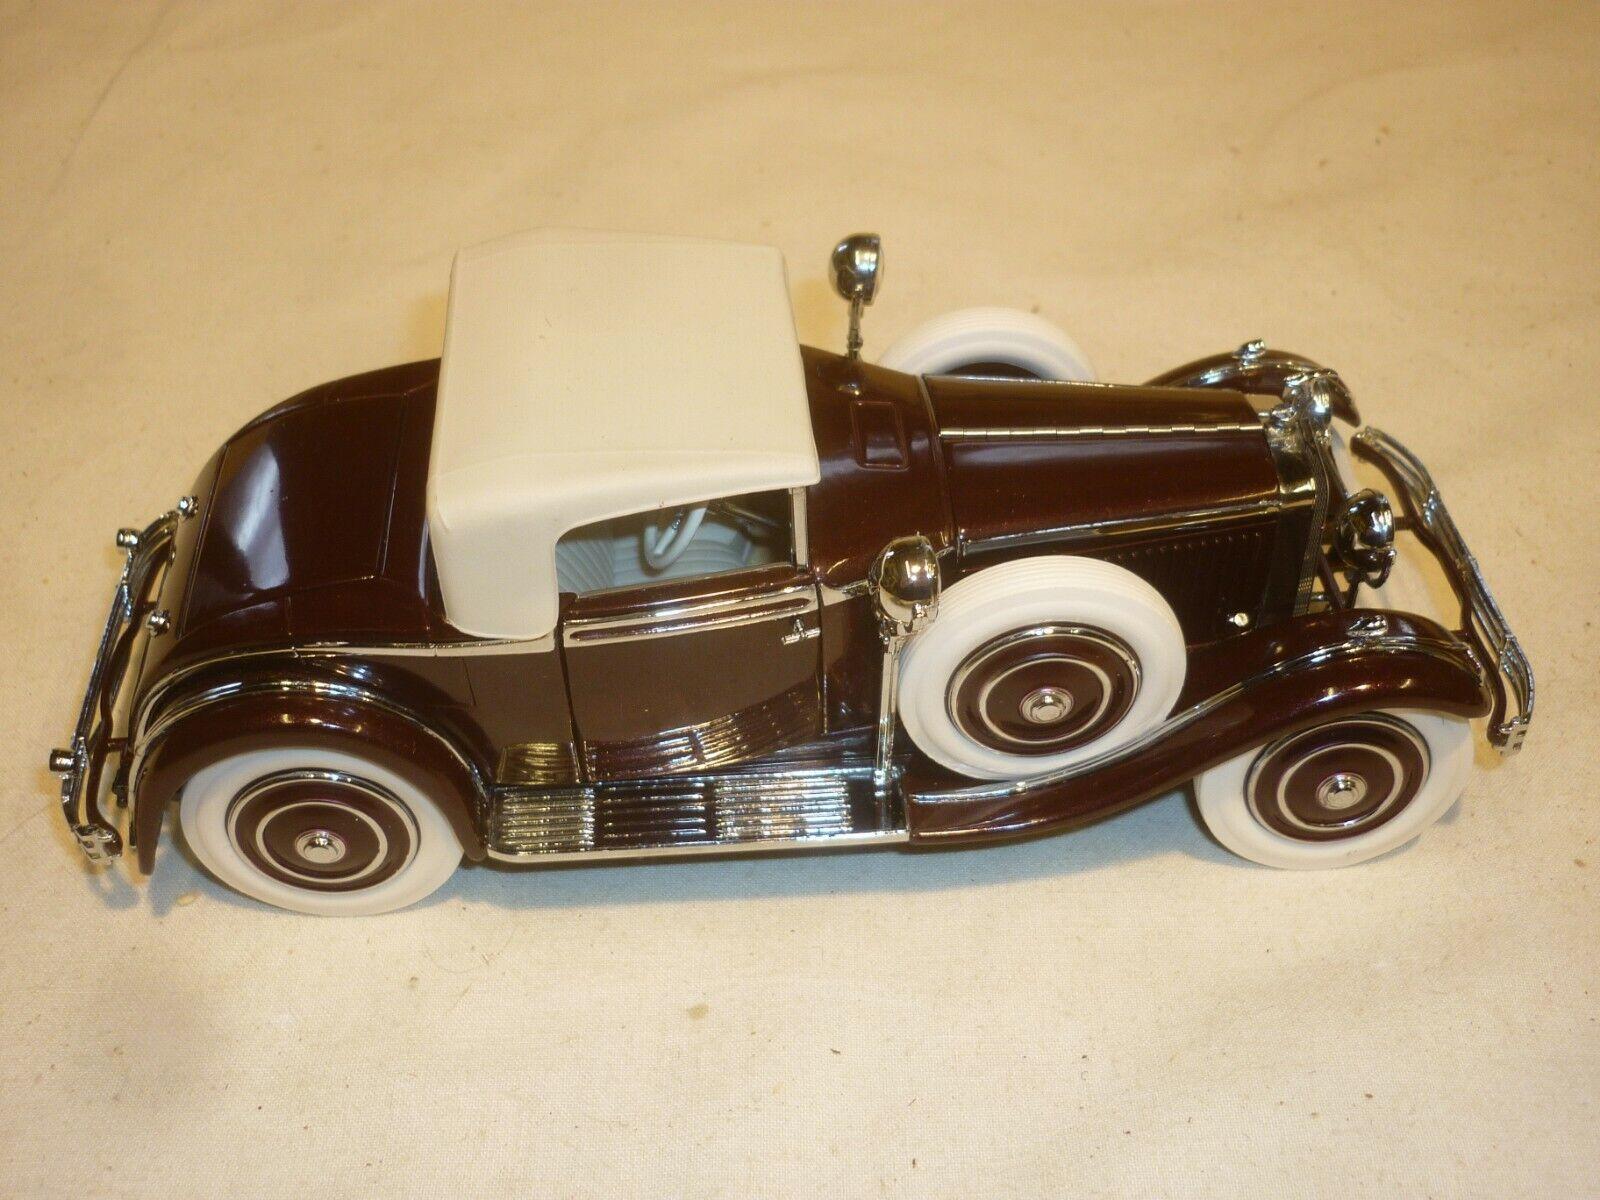 A Franklin mint scale model of a 1925 Hispano Suiza H6B Kellner, no box